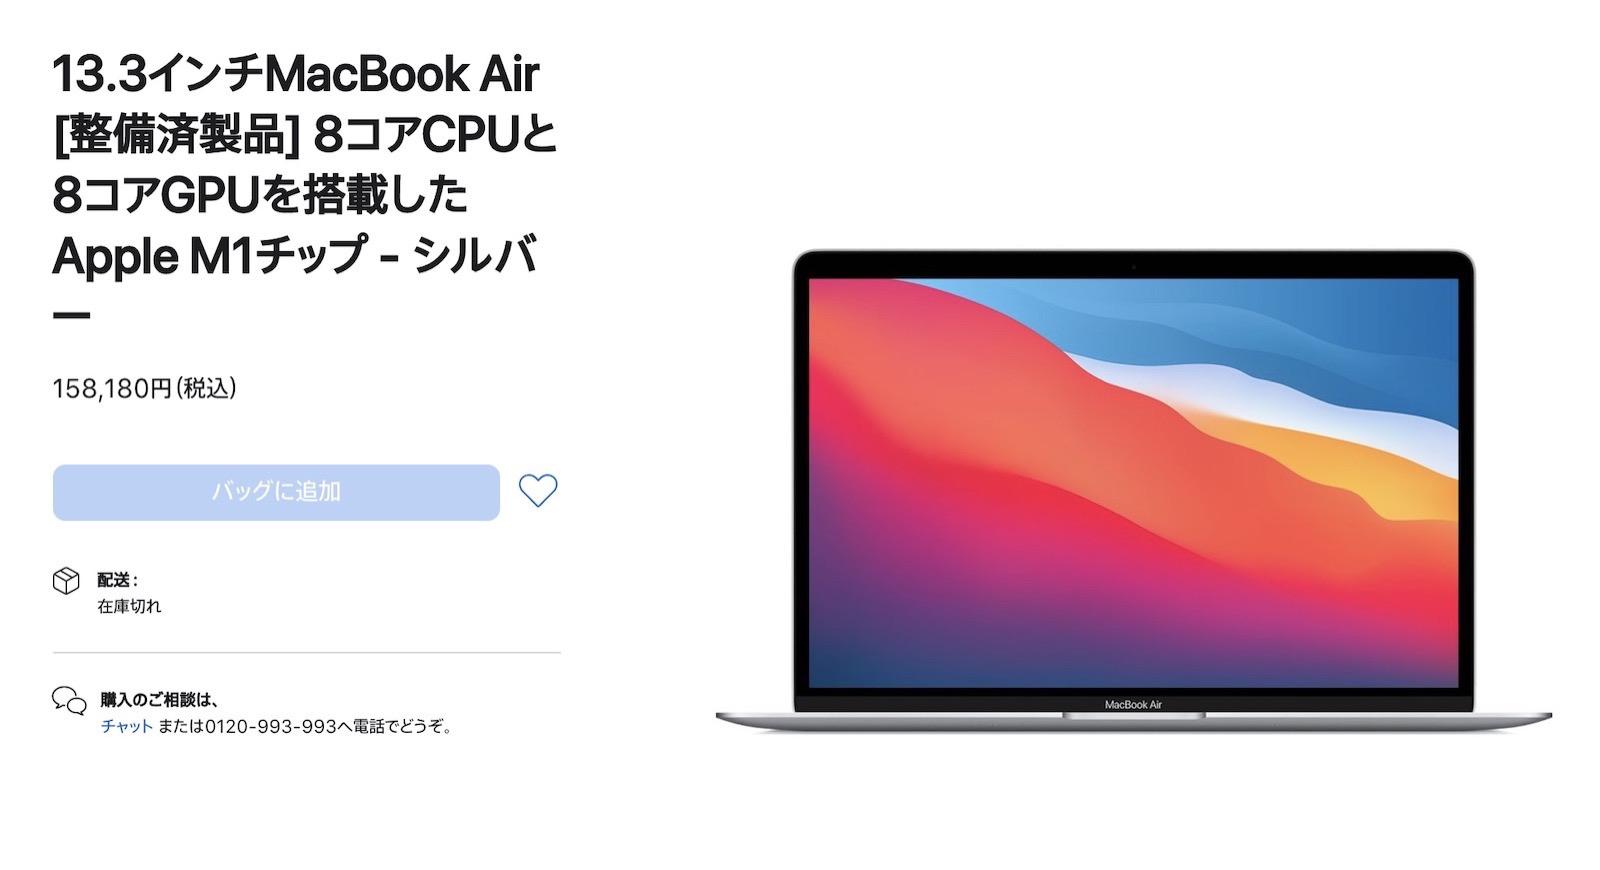 Macbook air refurbished 1tb 16gb